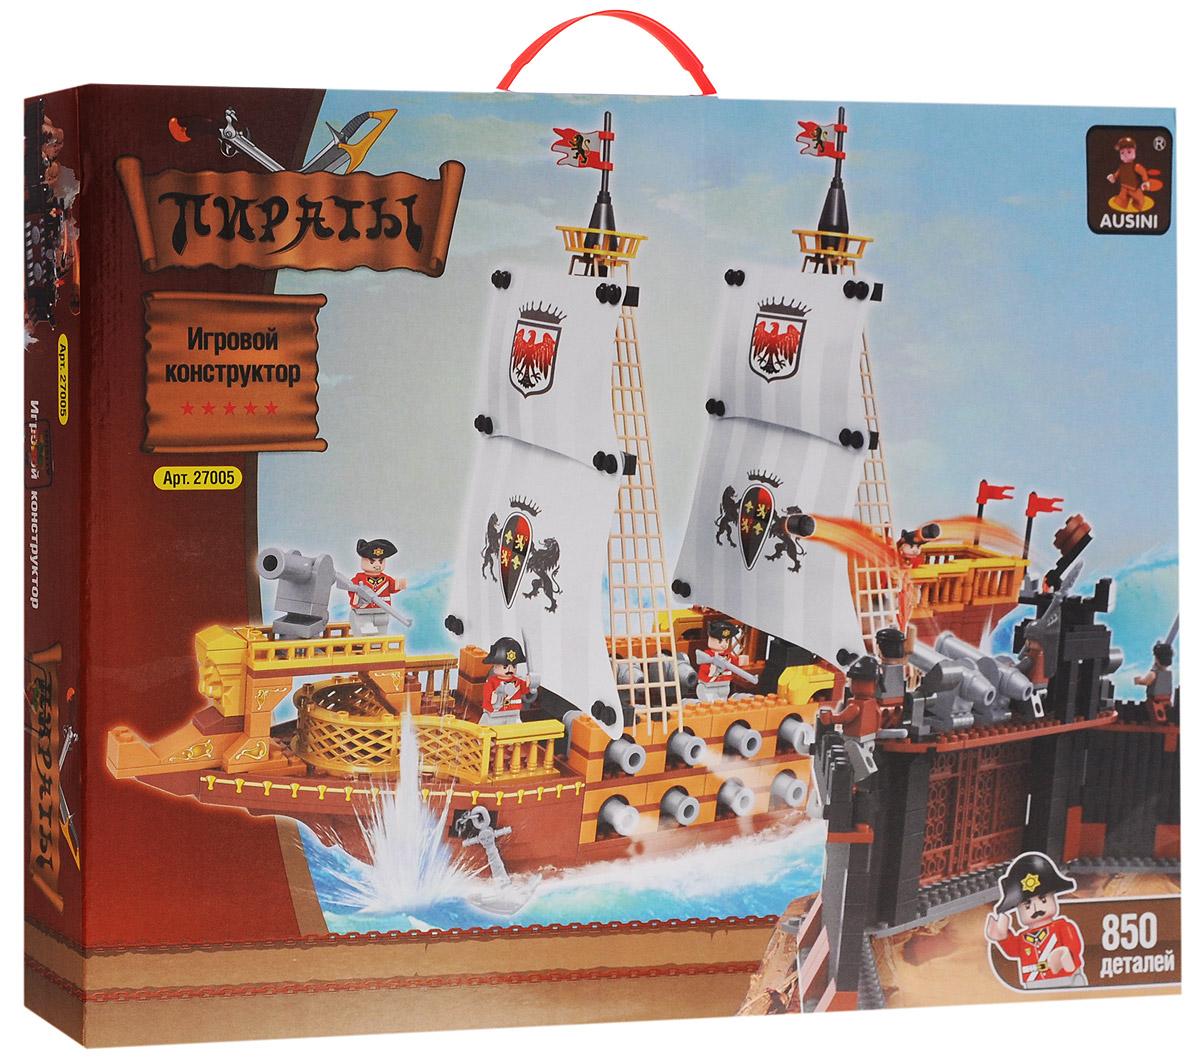 Ausini Конструктор Пираты